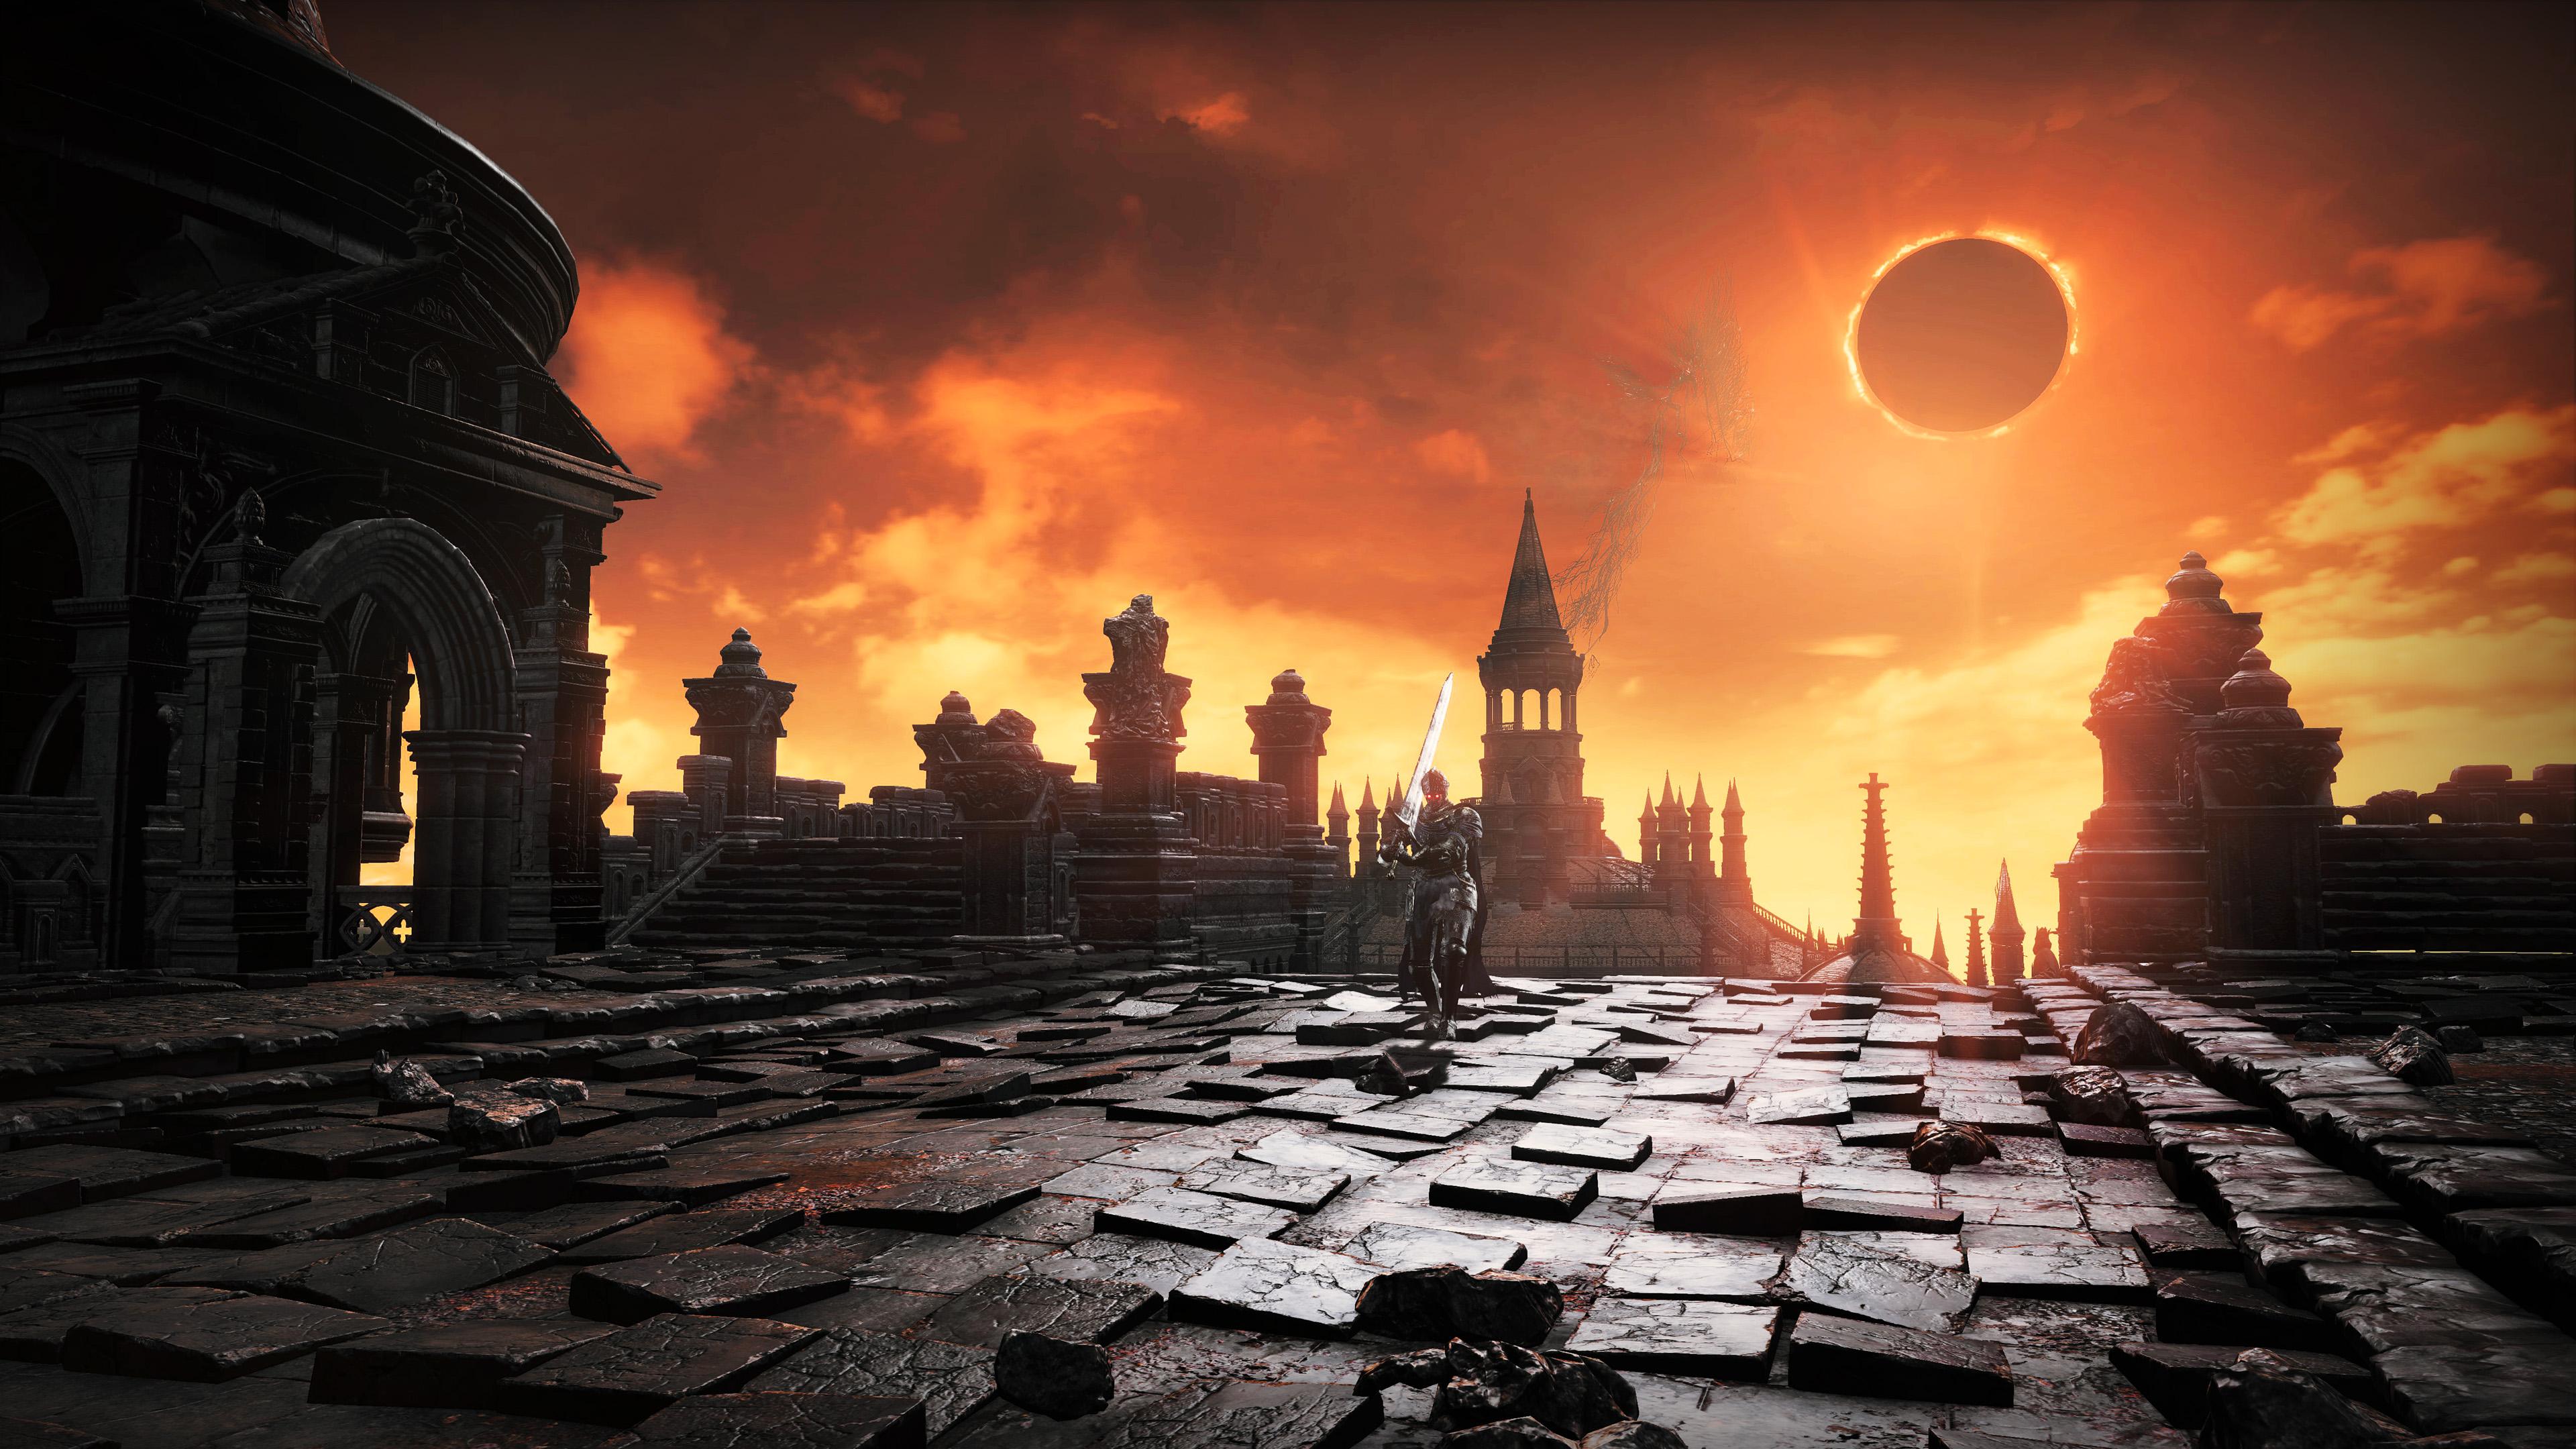 Dark Souls 3 4k Hd Games 4k Wallpapers Images Backgrounds